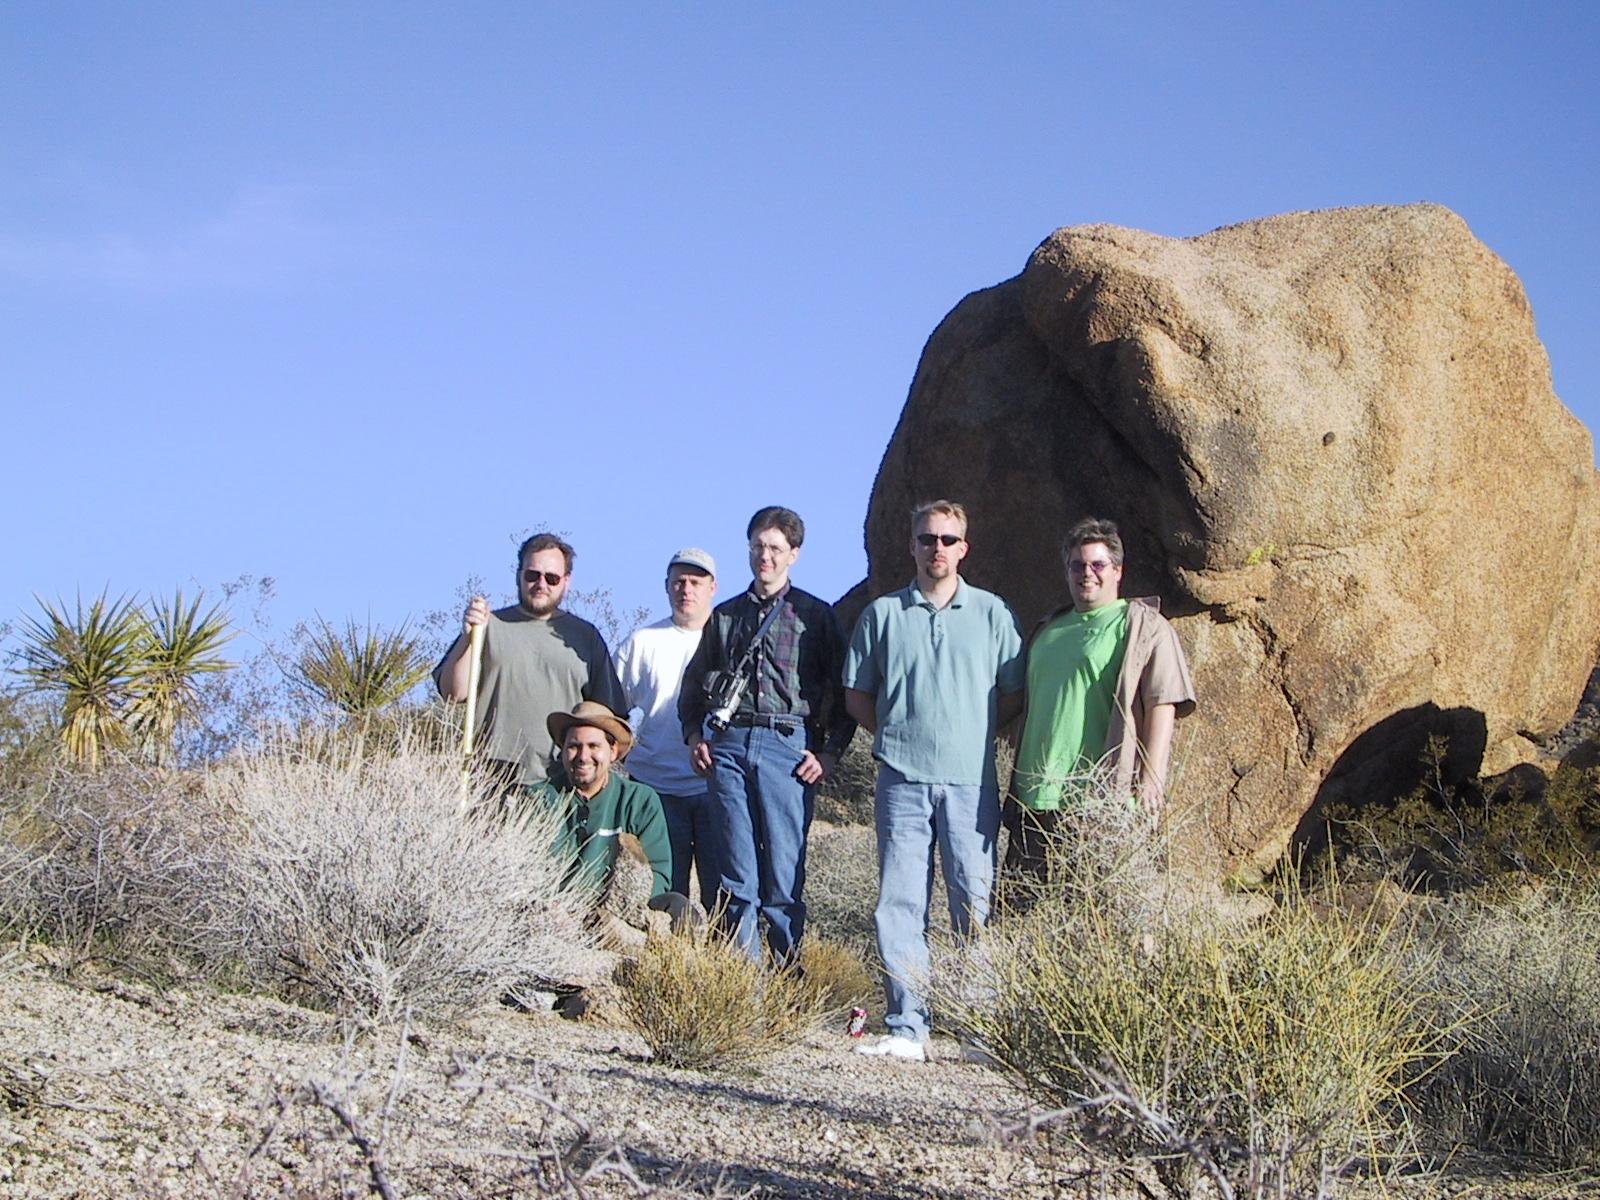 Steve, Dwight, Chris, Joe, Ted, Mike